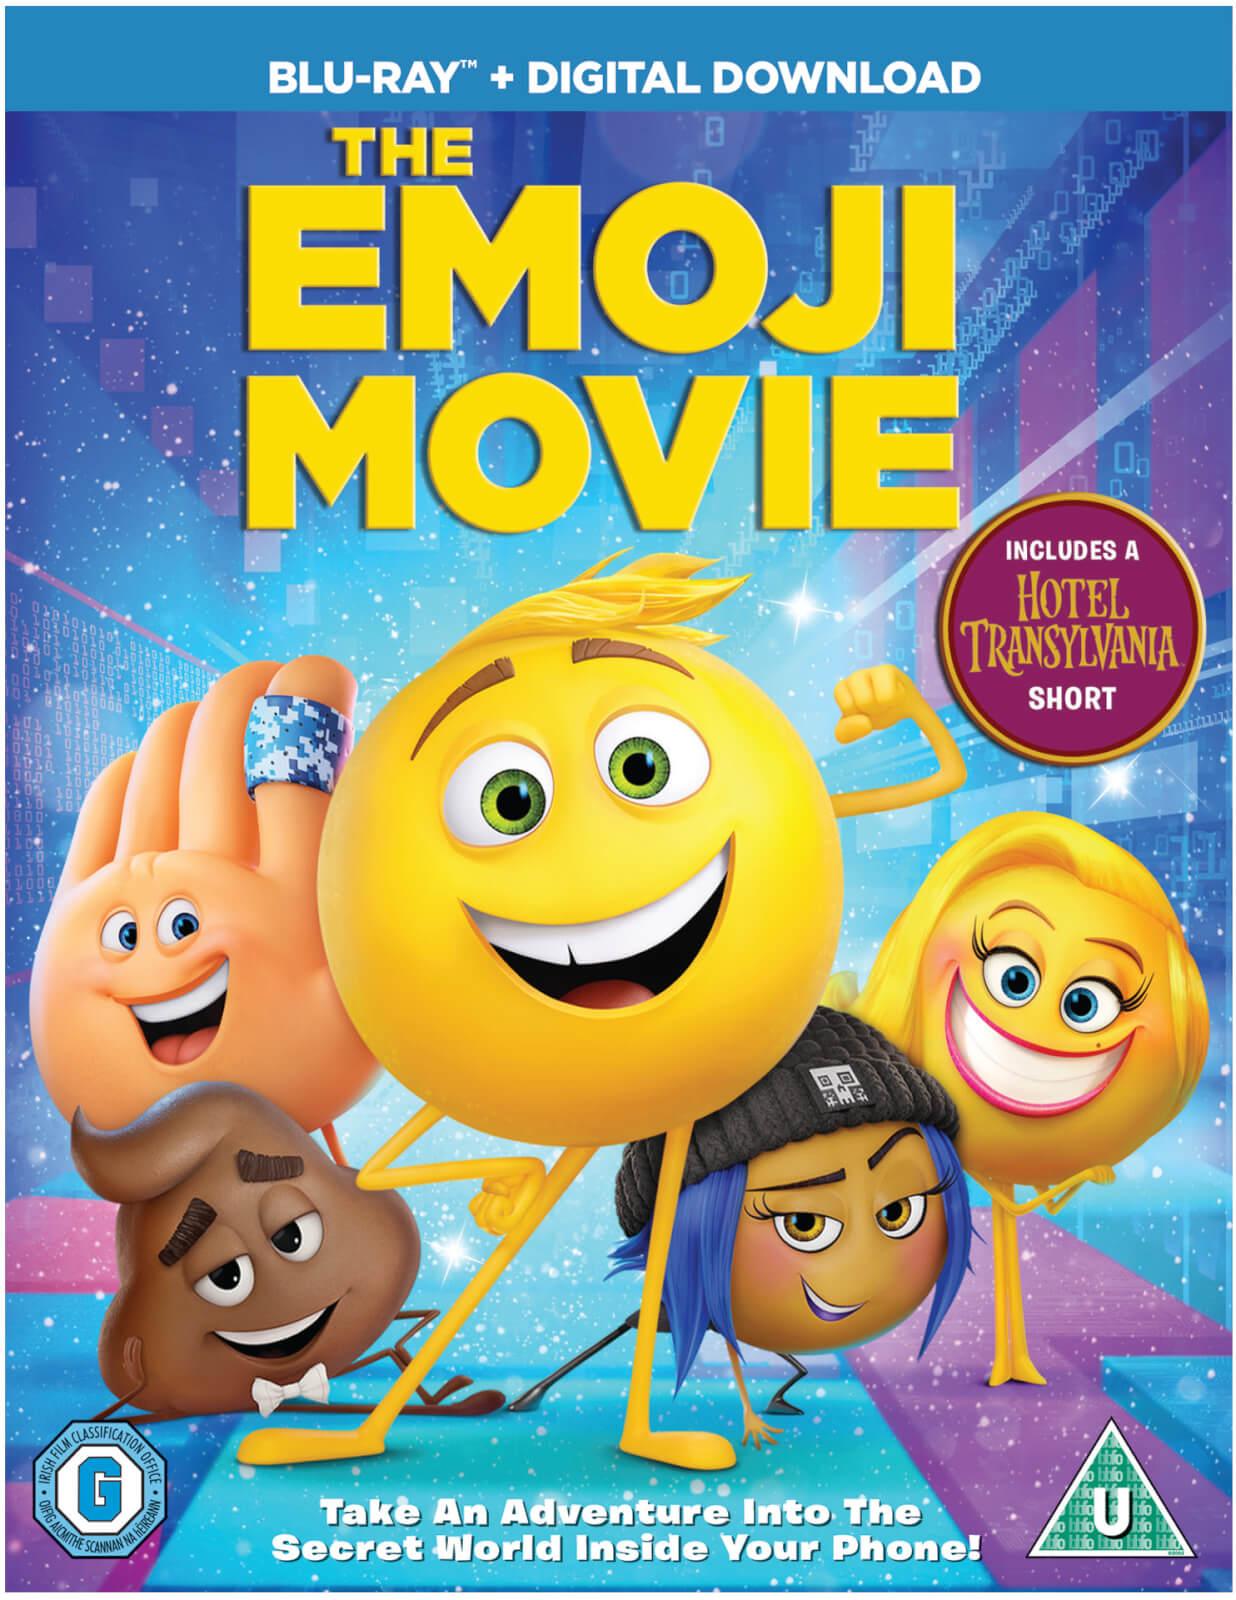 THE EMOJI MOVIE. Blu-Ray + Digital Download £3.99 @ Amazon UK